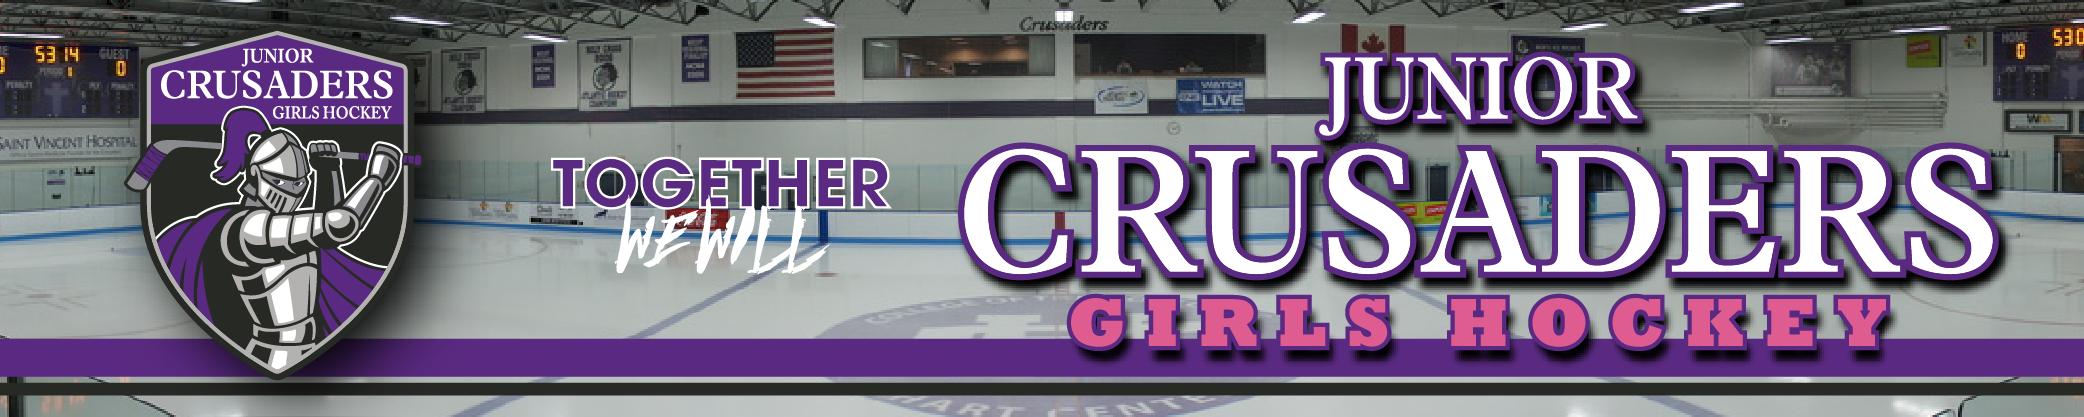 Junior Crusaders Girls Hockey, Hockey, Goal, Rink